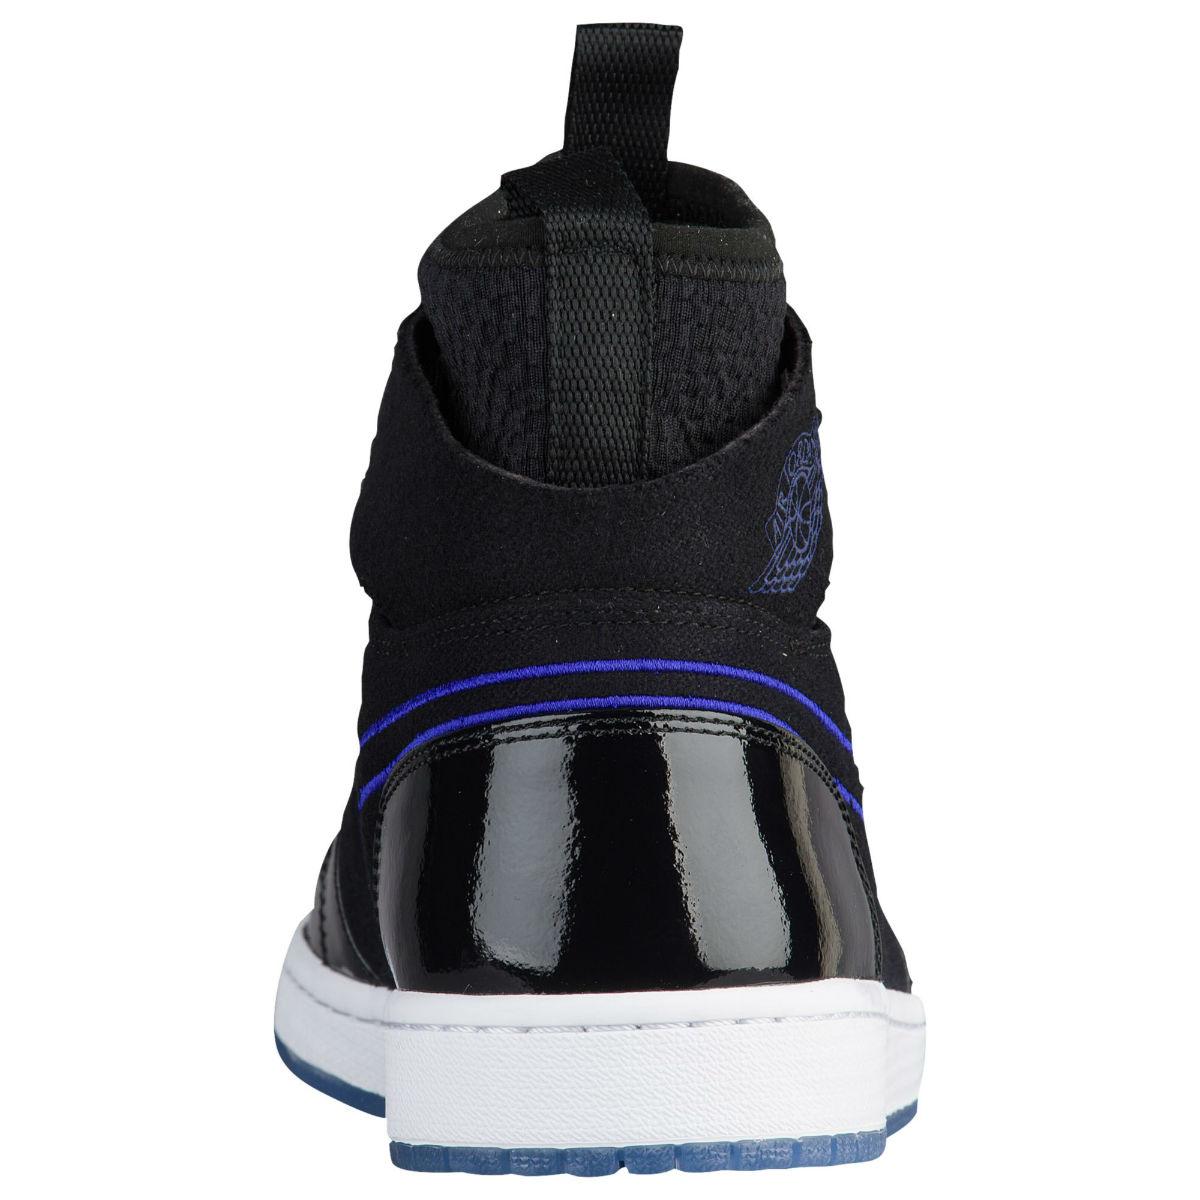 save off d7131 a4362 air jordan 1 retro ultra high space jam. Mens Air Jordan 1 Retro Ultra High  Black Concord White 844700 002 Space Jam Nike